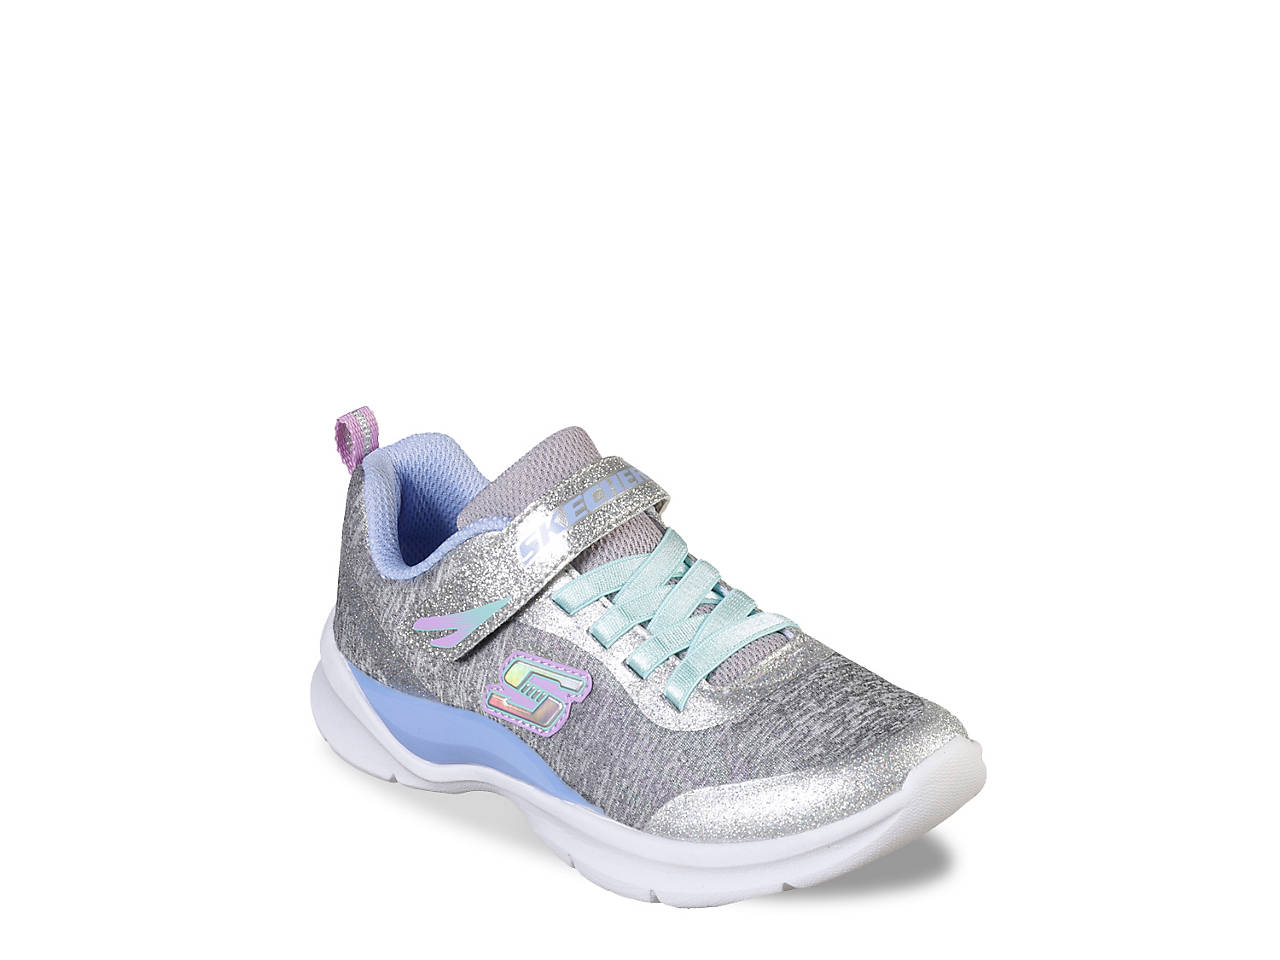 e426adc6ea127 Skechers Tech Groove Sparkle Glitz Toddler   Youth Sneaker Kids ...